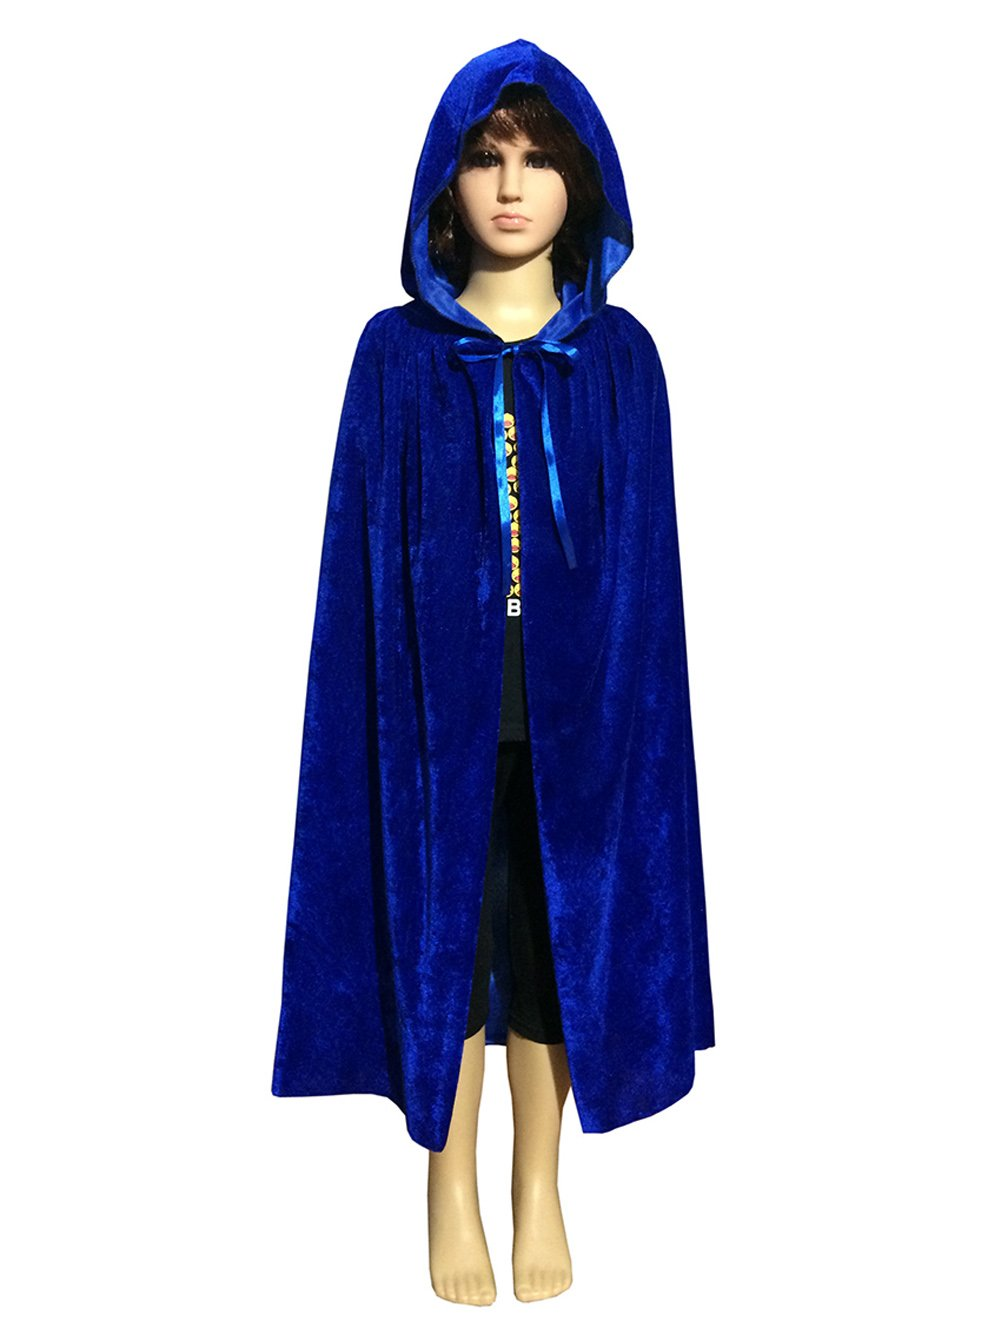 Magic Halloween Christmas Party Vampire Hooded Cloak Cosplay Dress Costume Cape (53'', Blue)